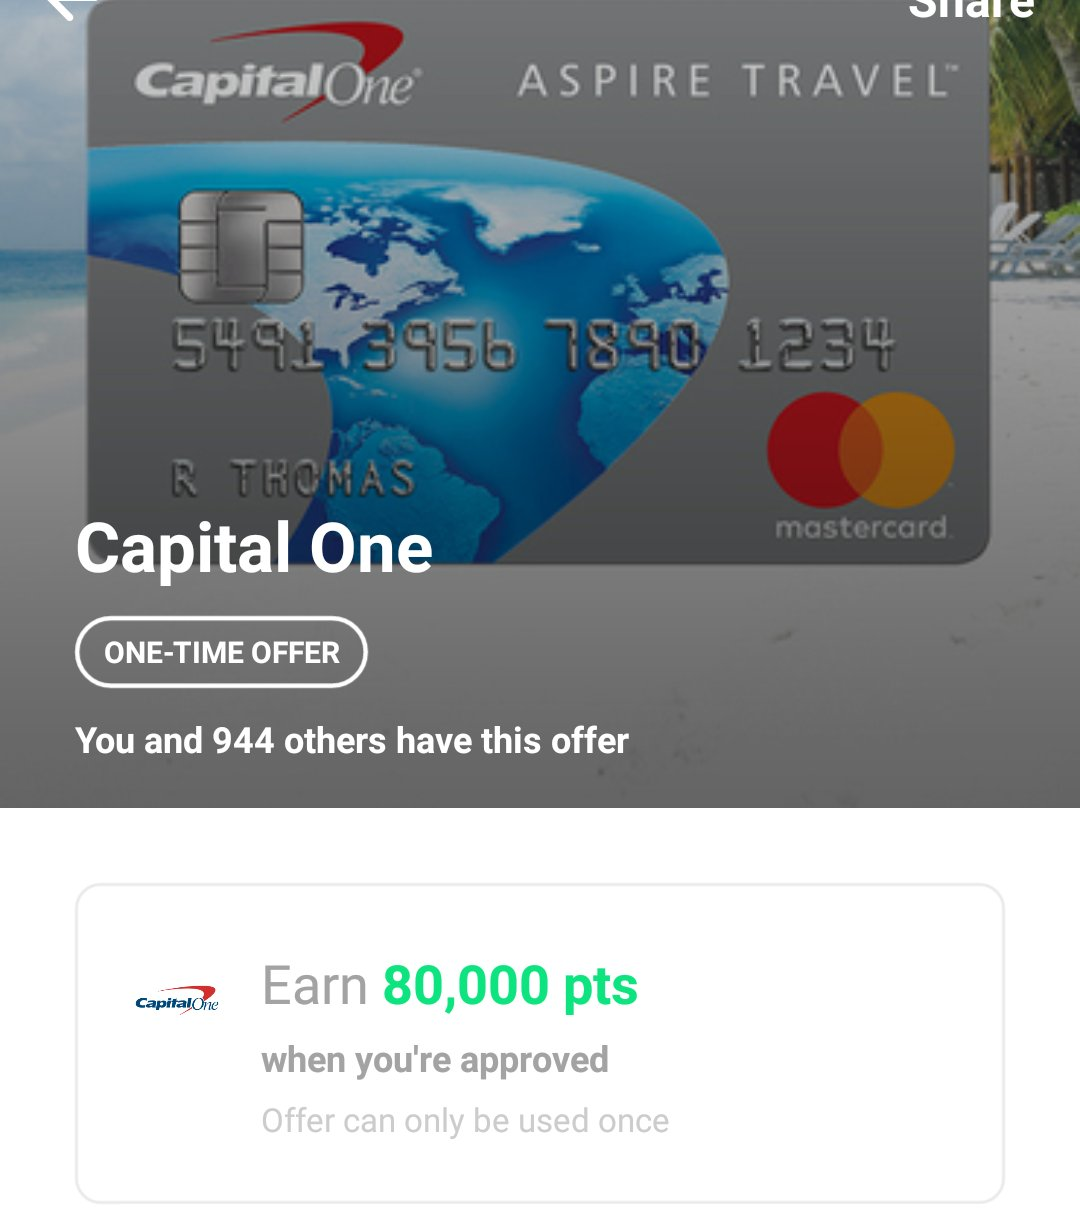 Capital One Aspire Platinum Travel Mastercard: 80,000 Drop